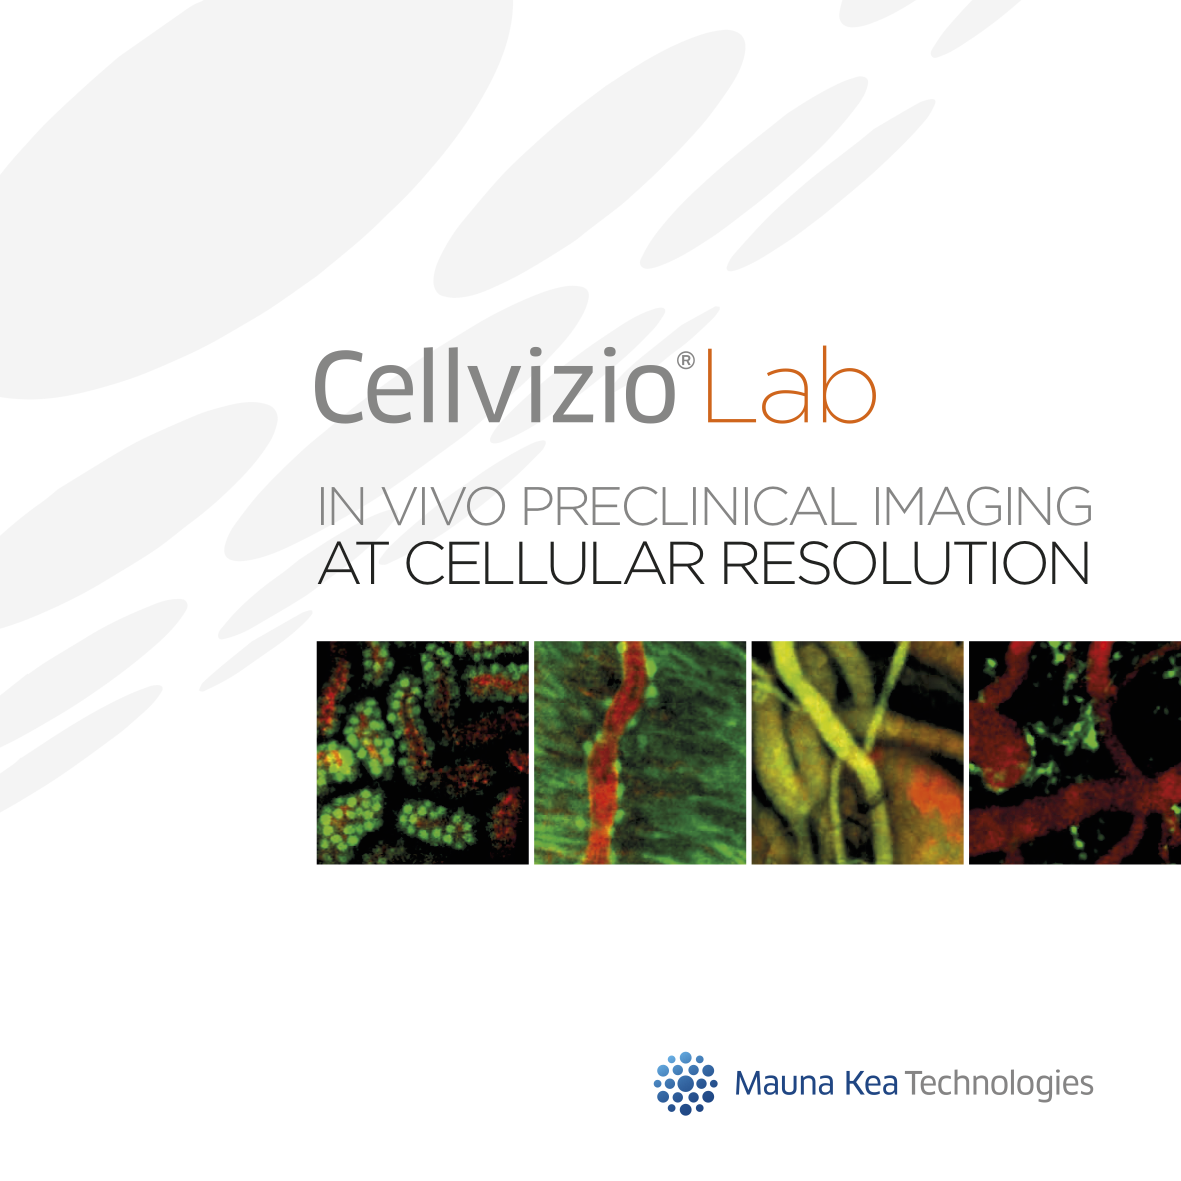 Cellvizio LAB Brochure cover 2017.png